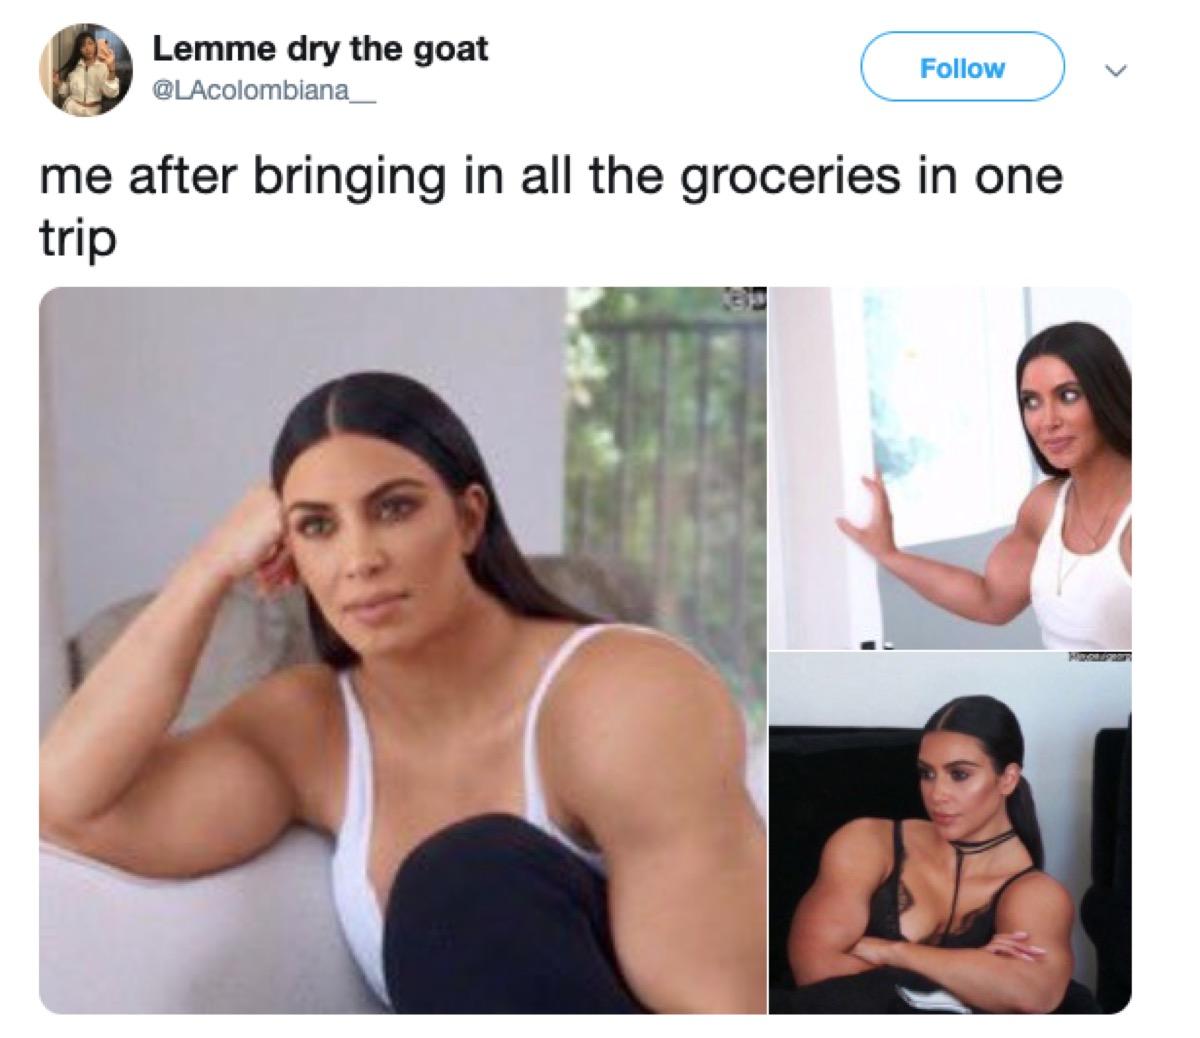 buff kim kardasian, 2019 memes